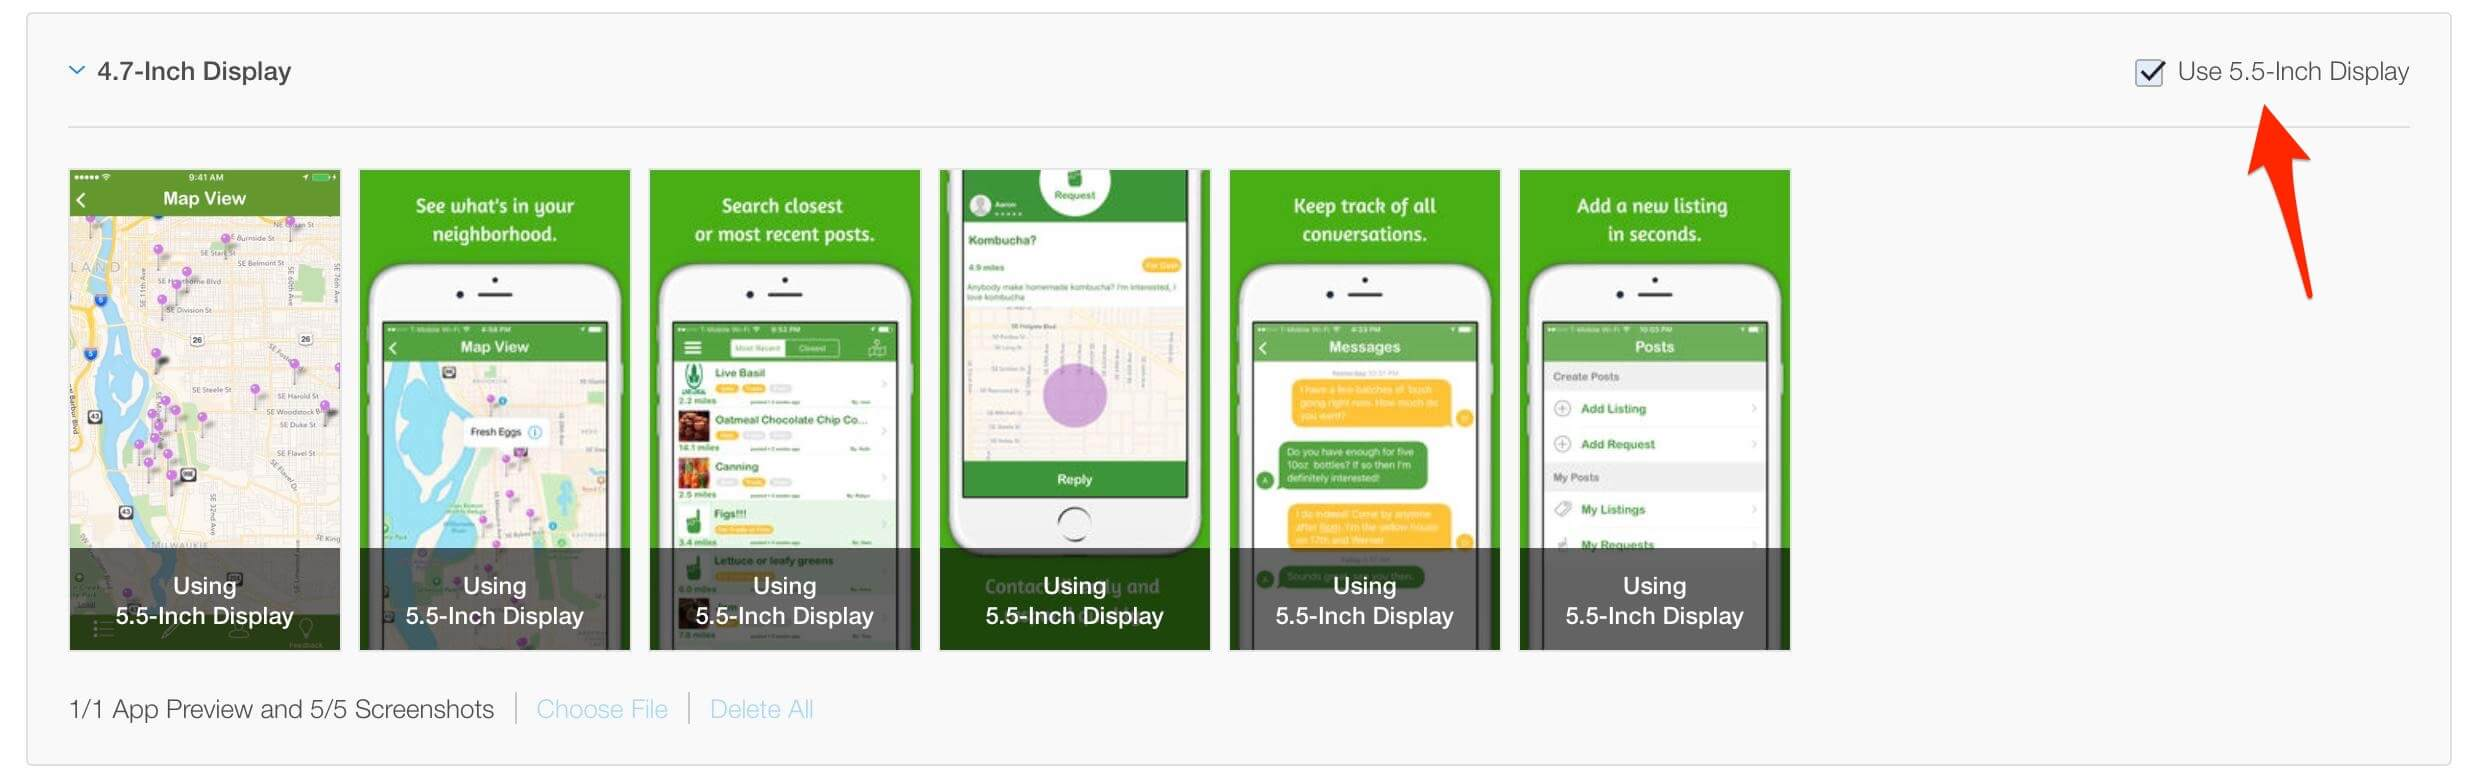 iOS Screenshot Sizes | Placeit Blog